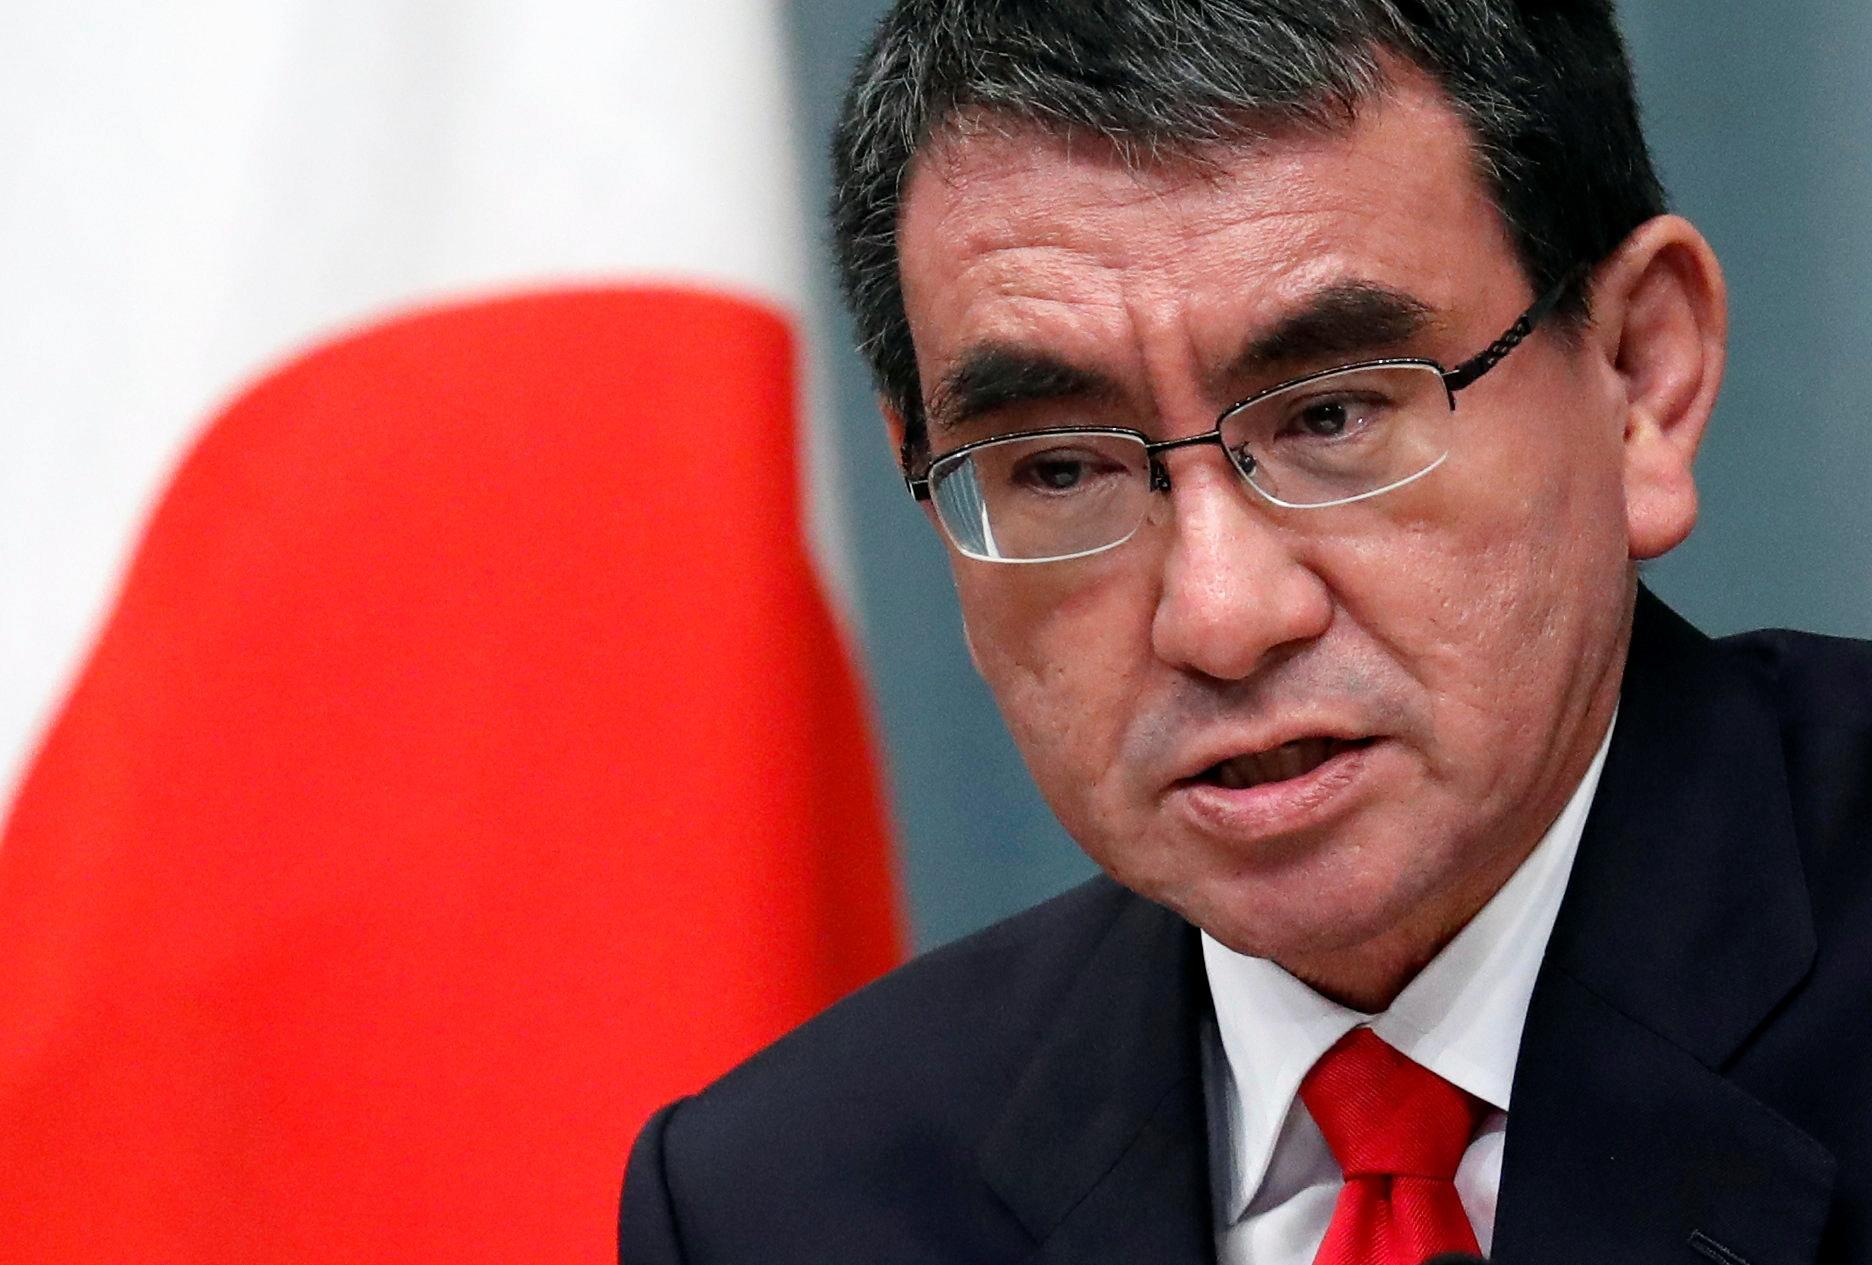 Japan defense minister: Not aware of any Iran involvement in Saudi attacks